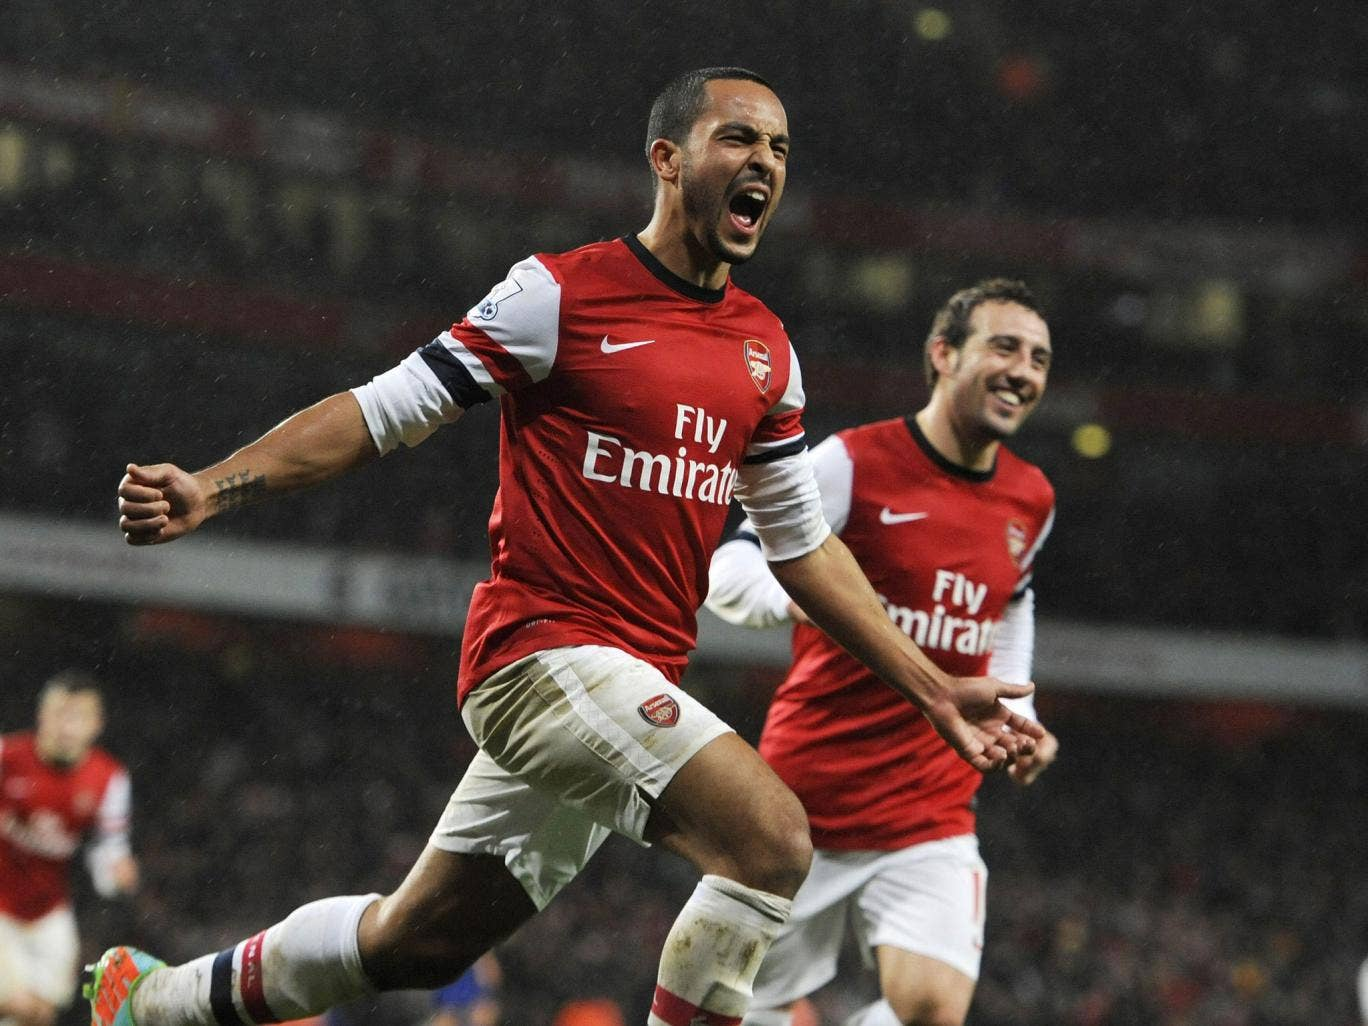 Arsenal's Theo Walcott celebrates his goal against Cardiff